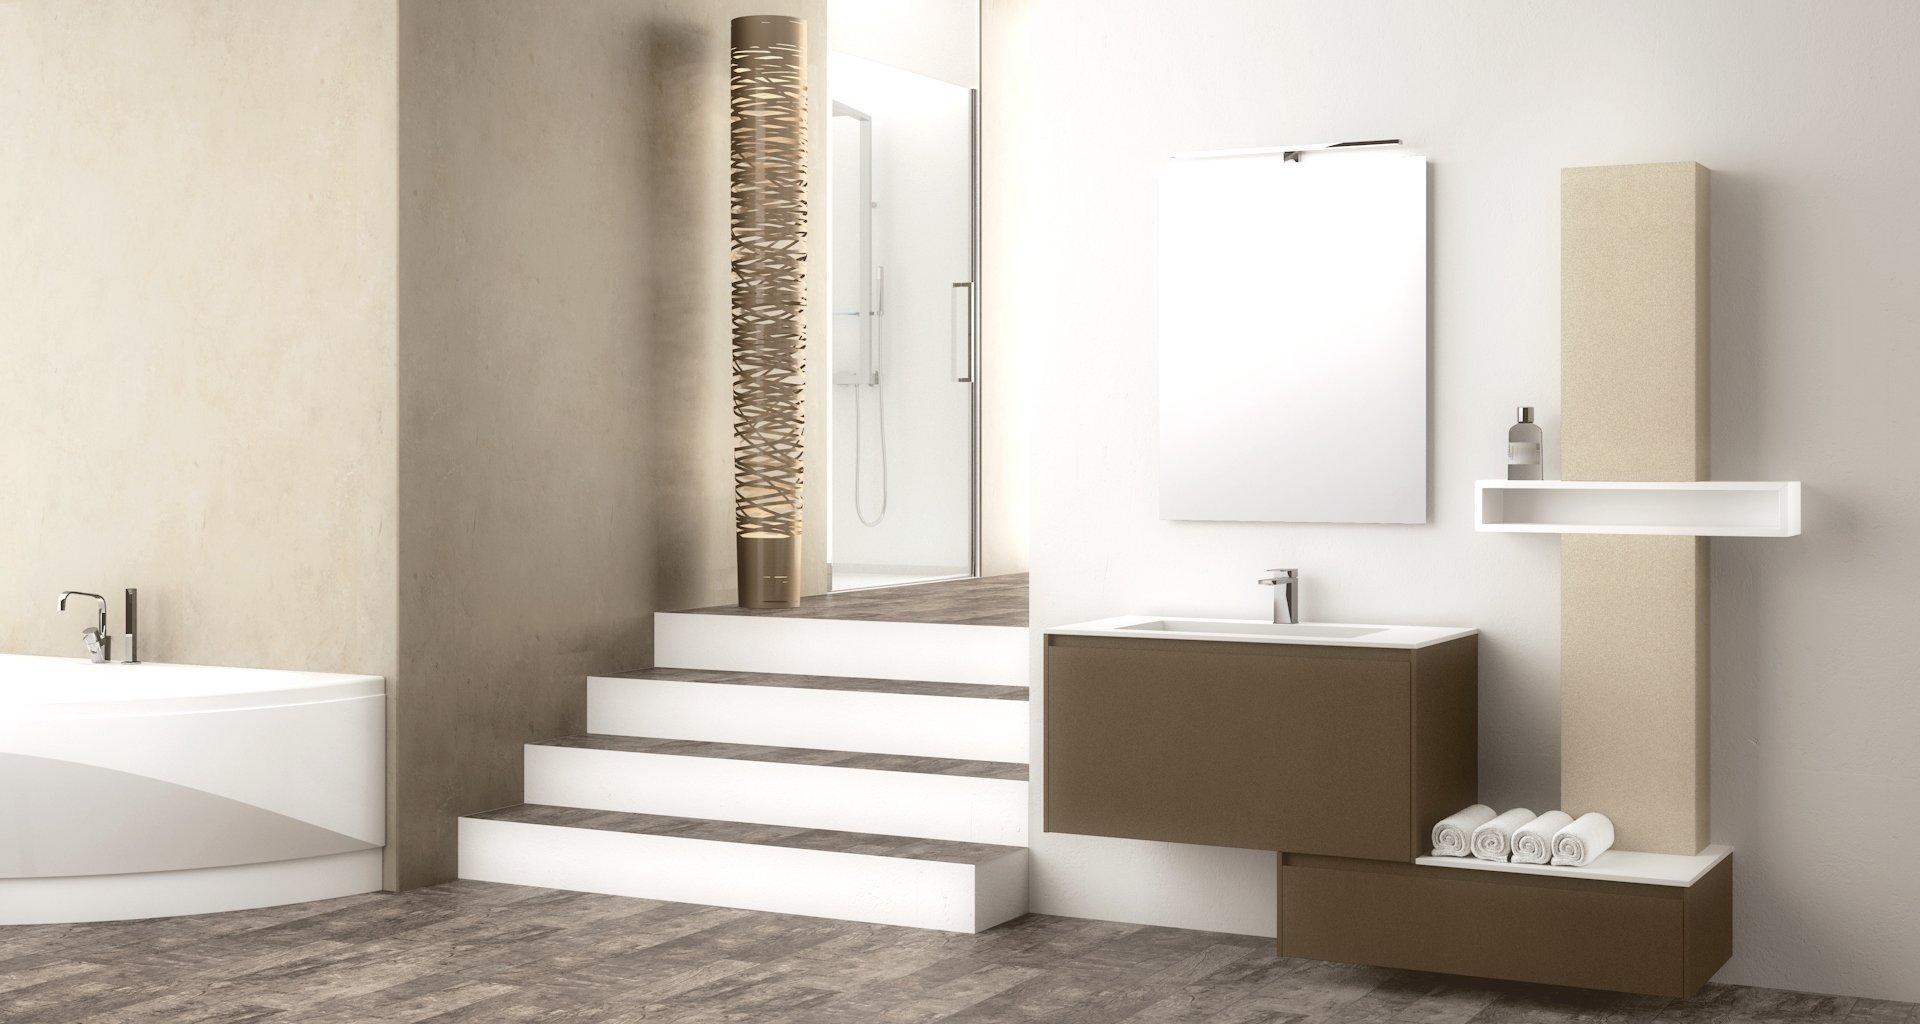 Orologio adesivi da parete leroy merlin - Mobili da bagno moderno ...